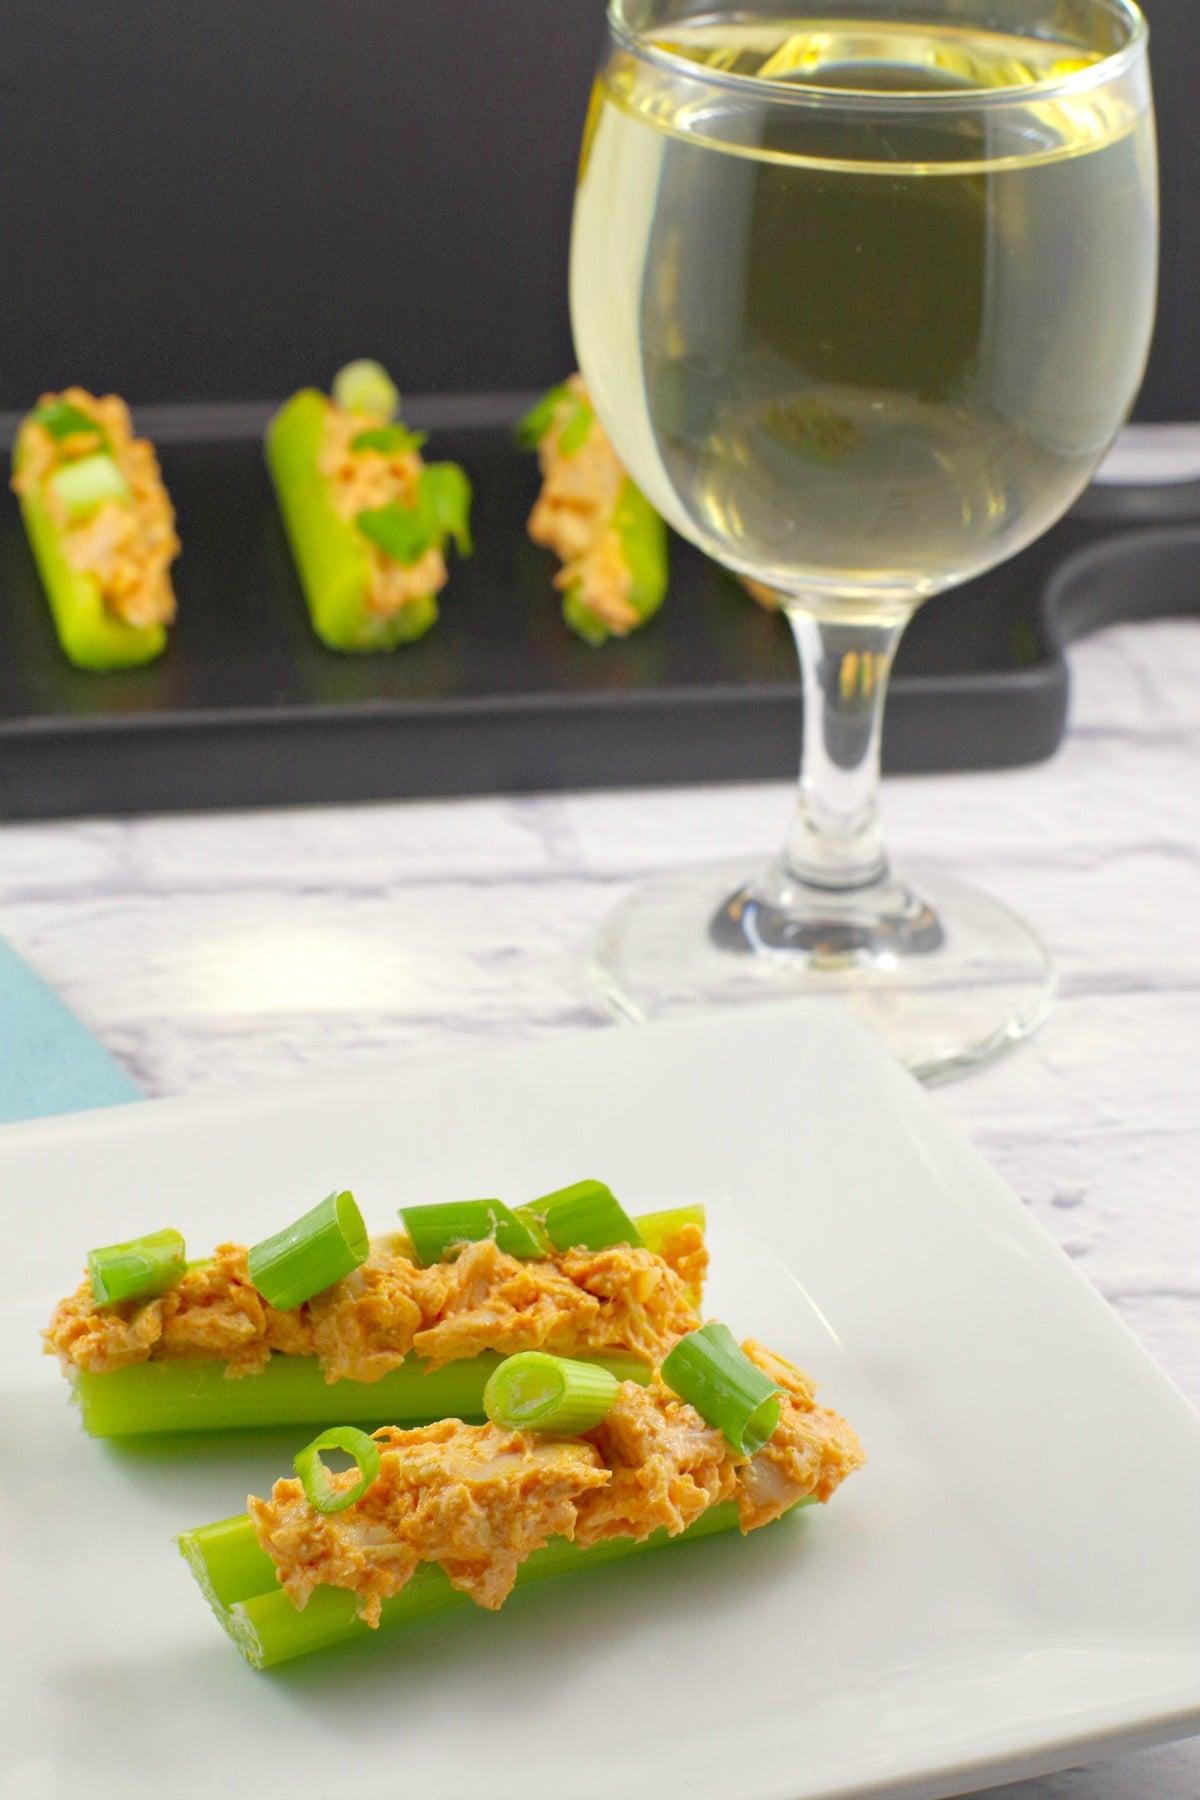 Weight watchers appetizer |Buffalo Chicken Celery - #gameday #buffalochicken #wwrecipes